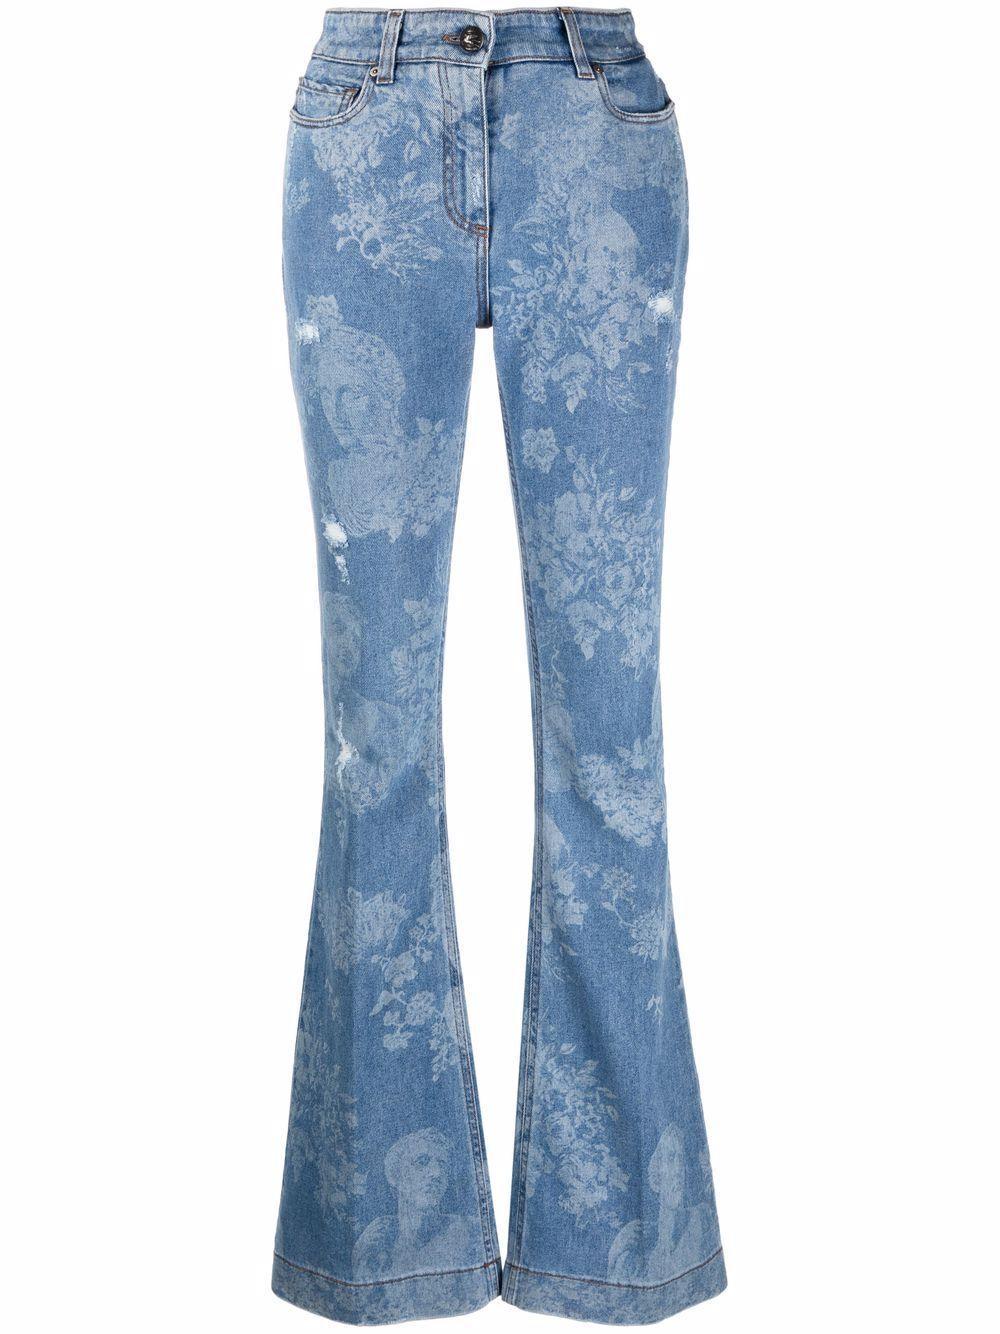 Svasato Printed Jeans Item # 212D184869050